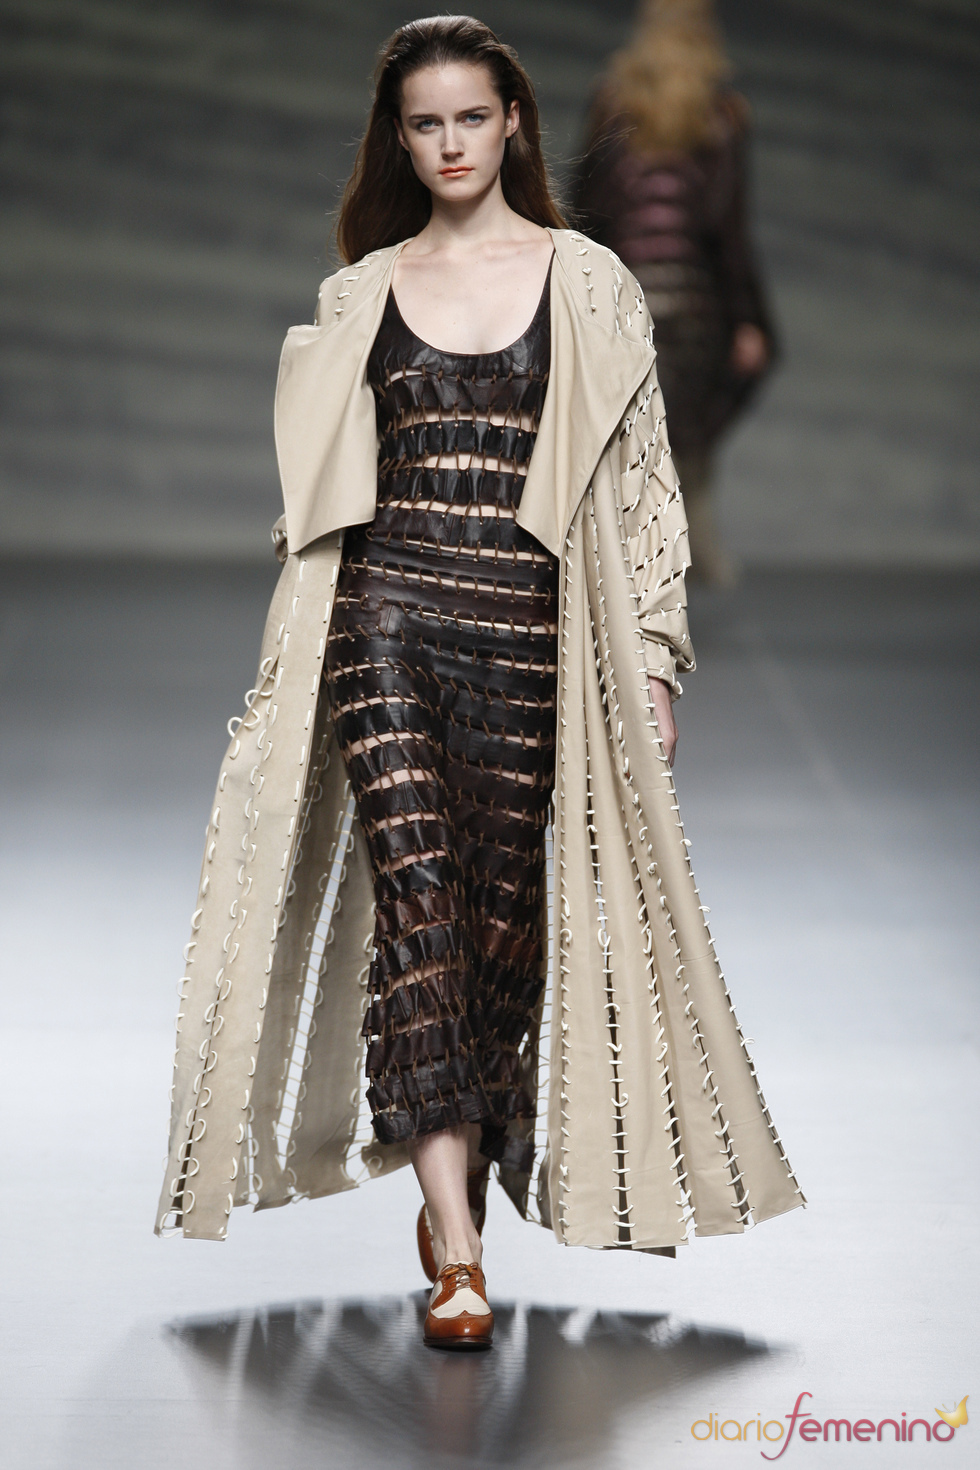 Amplio vestido de cuero de Martin Lamothe en la Madrid Fashion Week